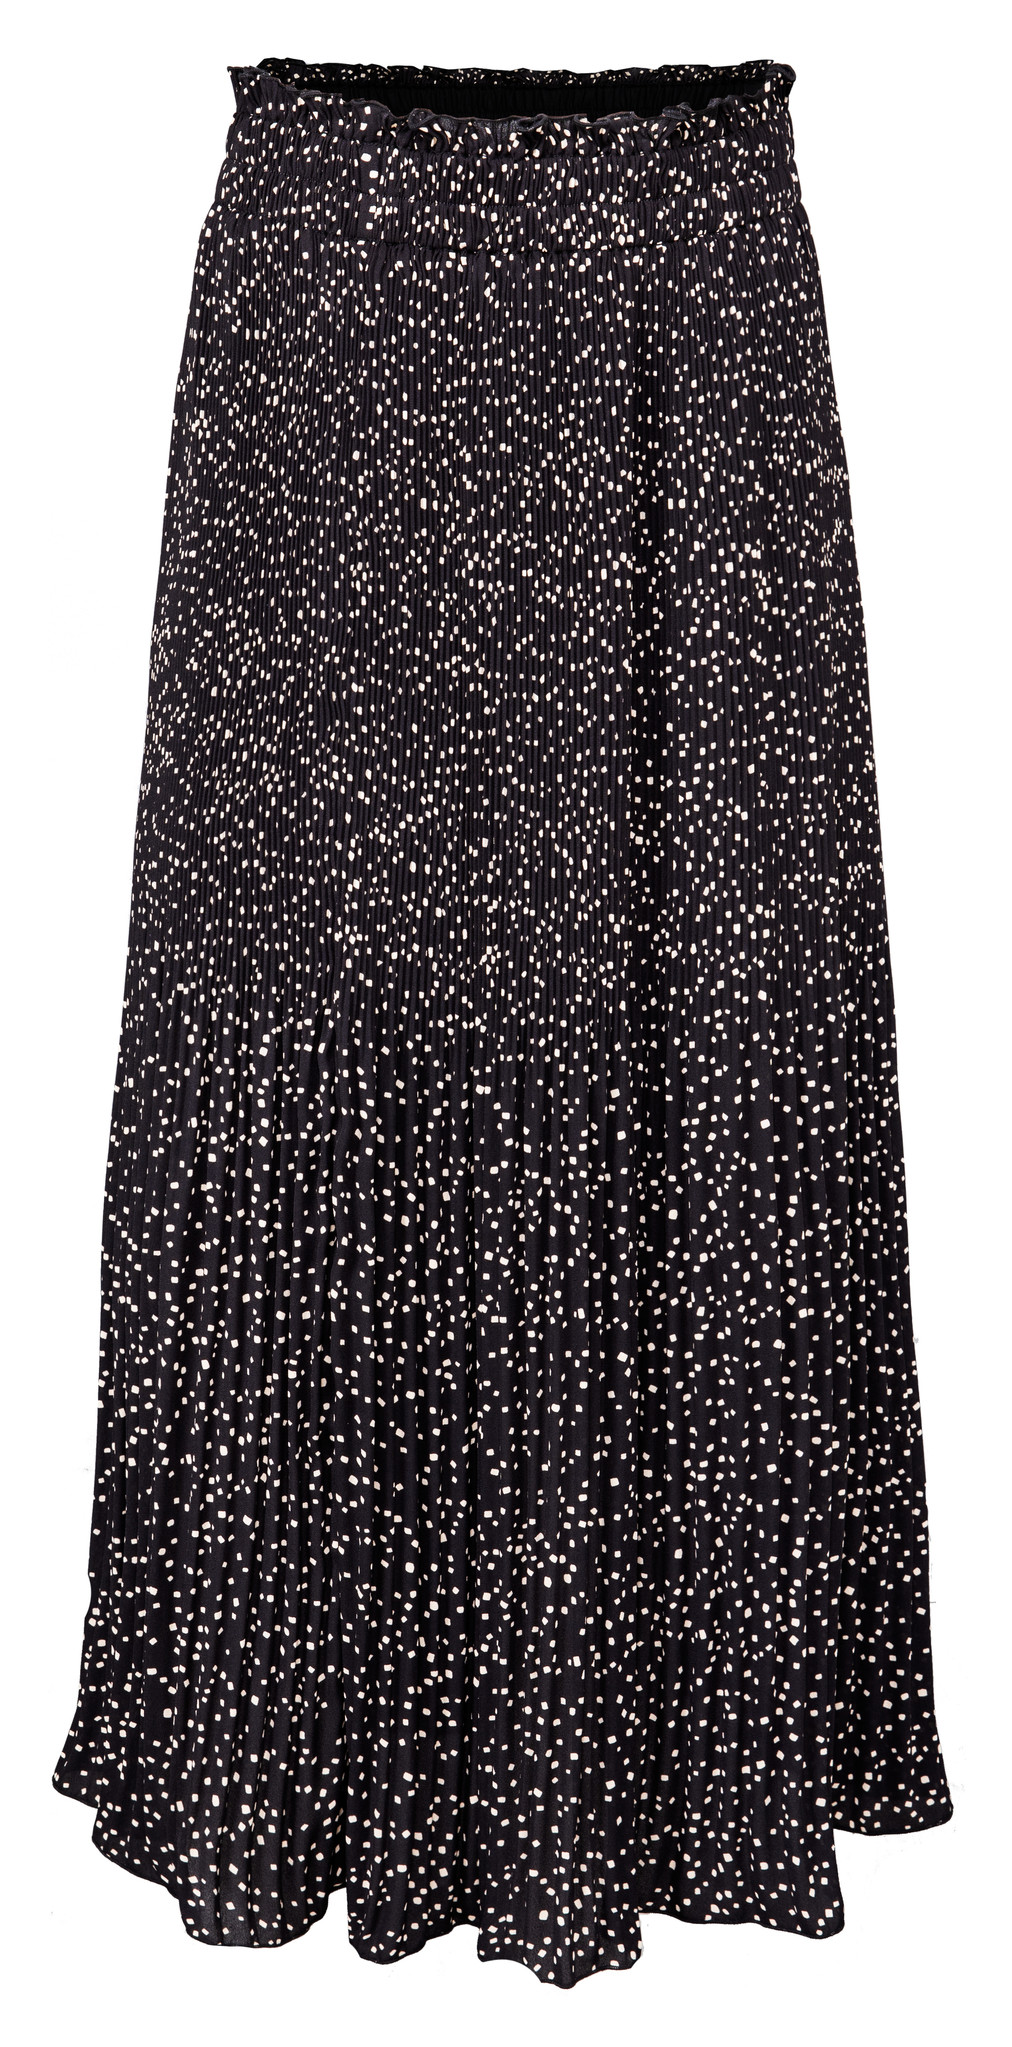 yaya Long plisse skirt 1401166-123-2